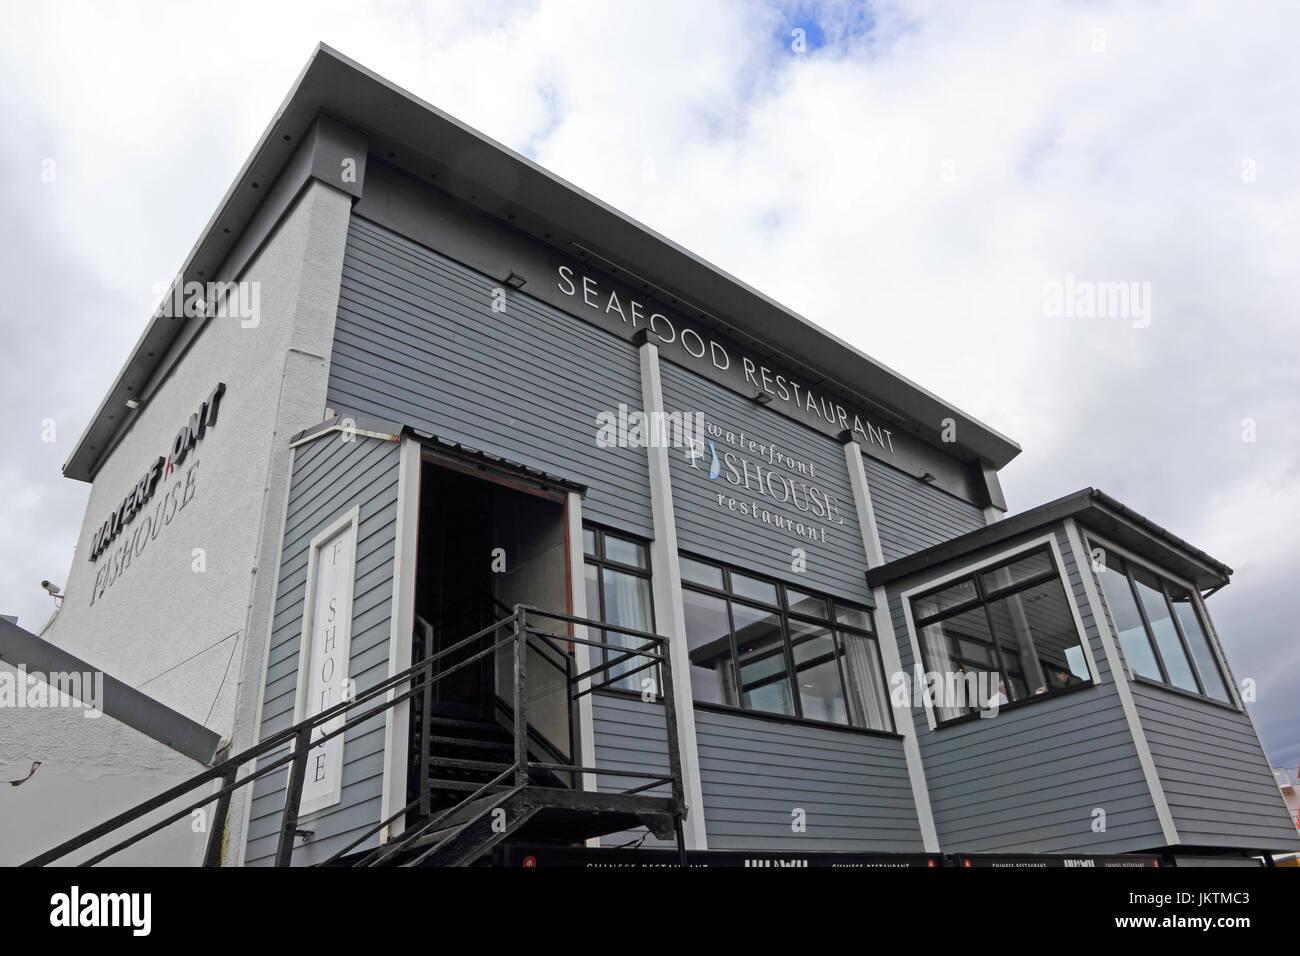 Waterfront Seahouse Restaurant, Oban, Scotland - Stock Image